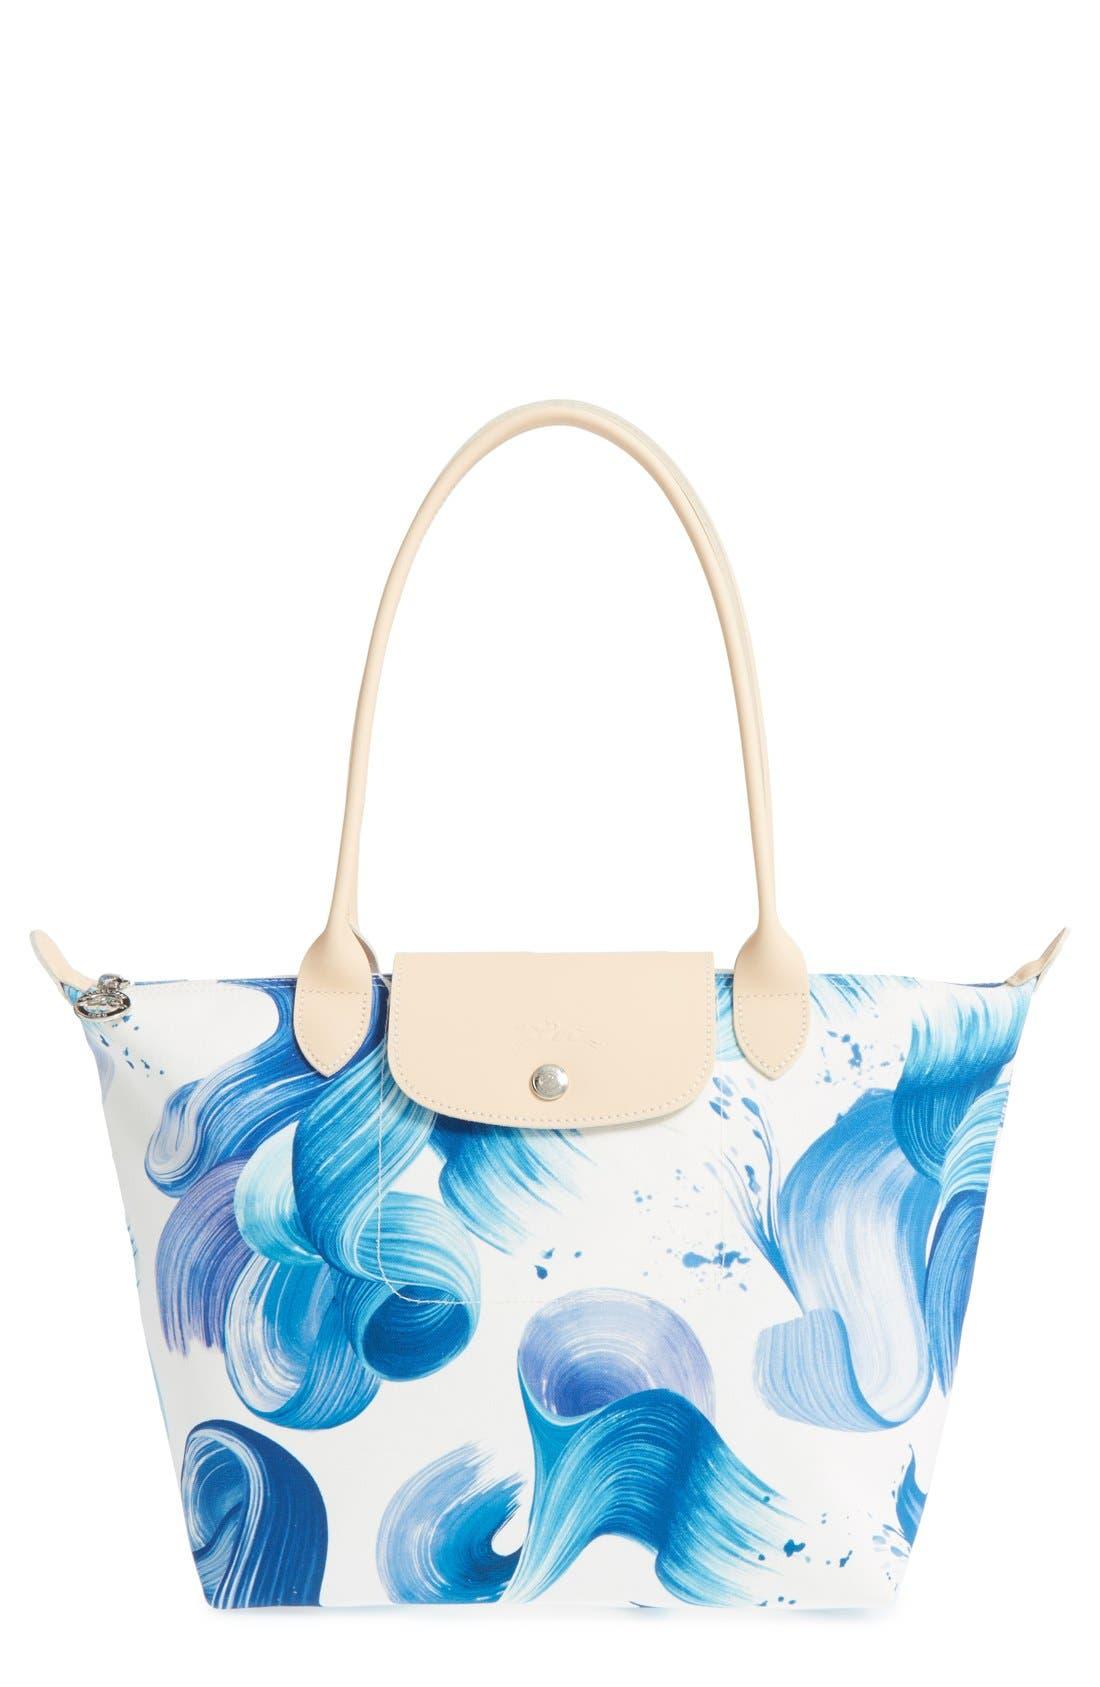 Alternate Image 1 Selected - Longchamp 'Medium Splash' Print Canvas Tote